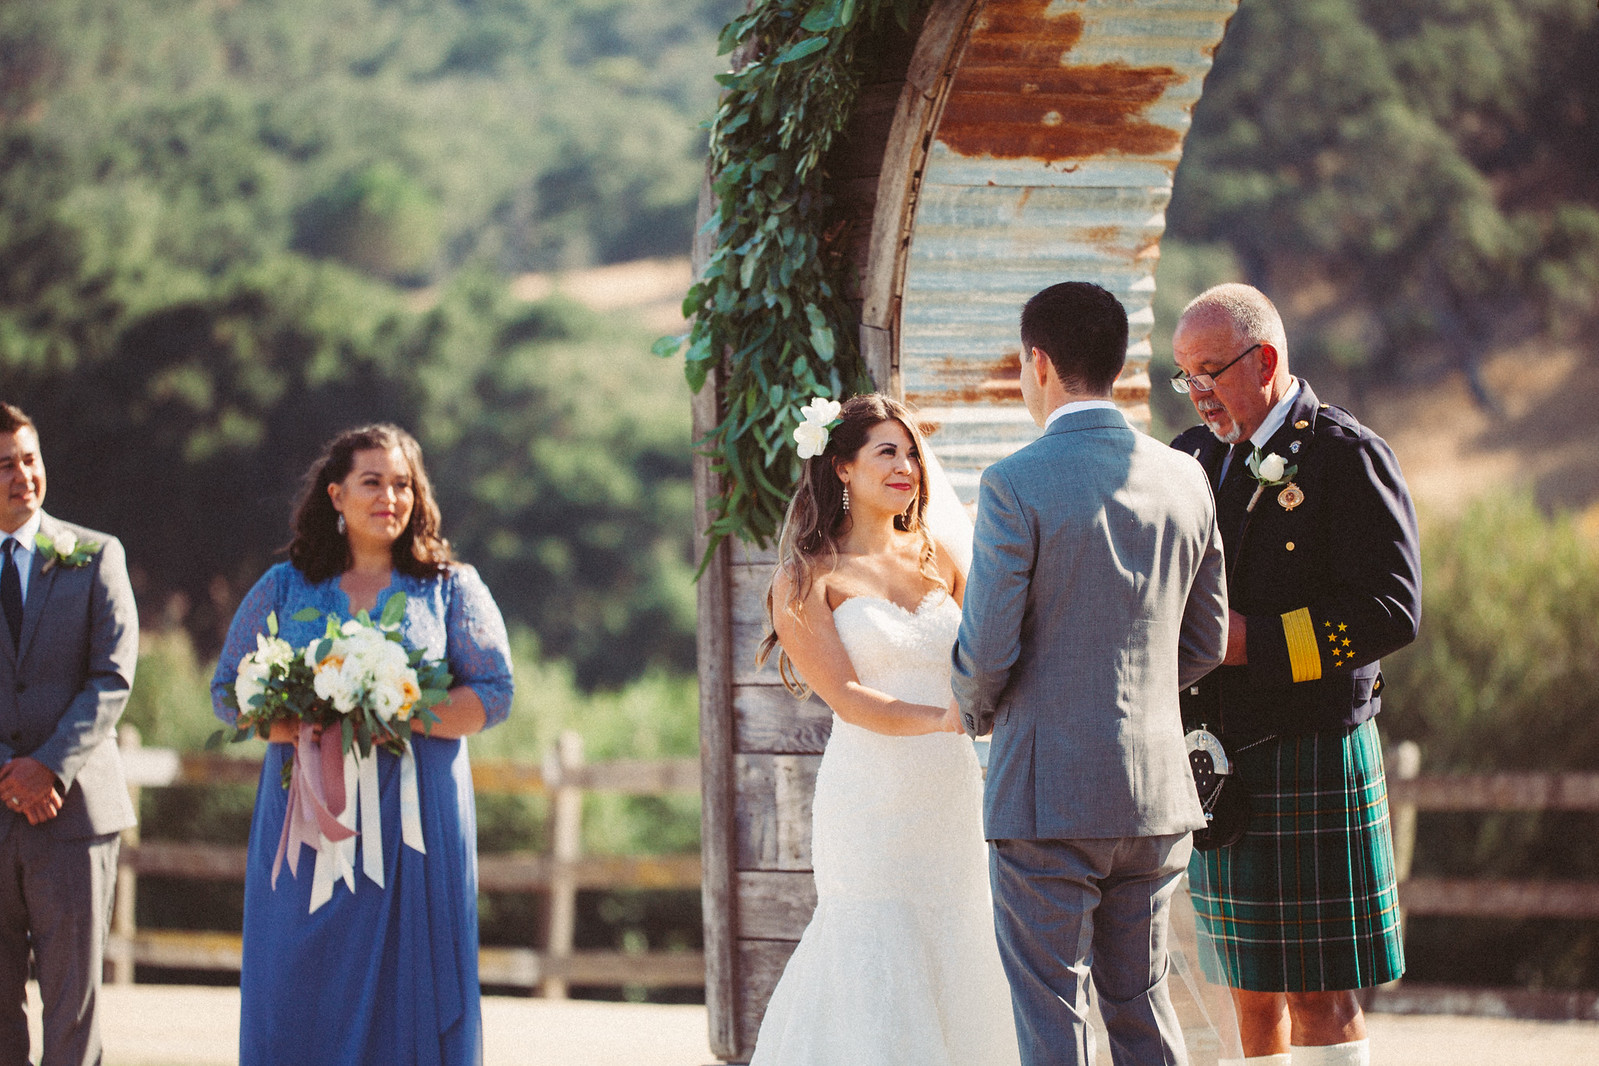 epiphany bride in justin alexander summer wedding